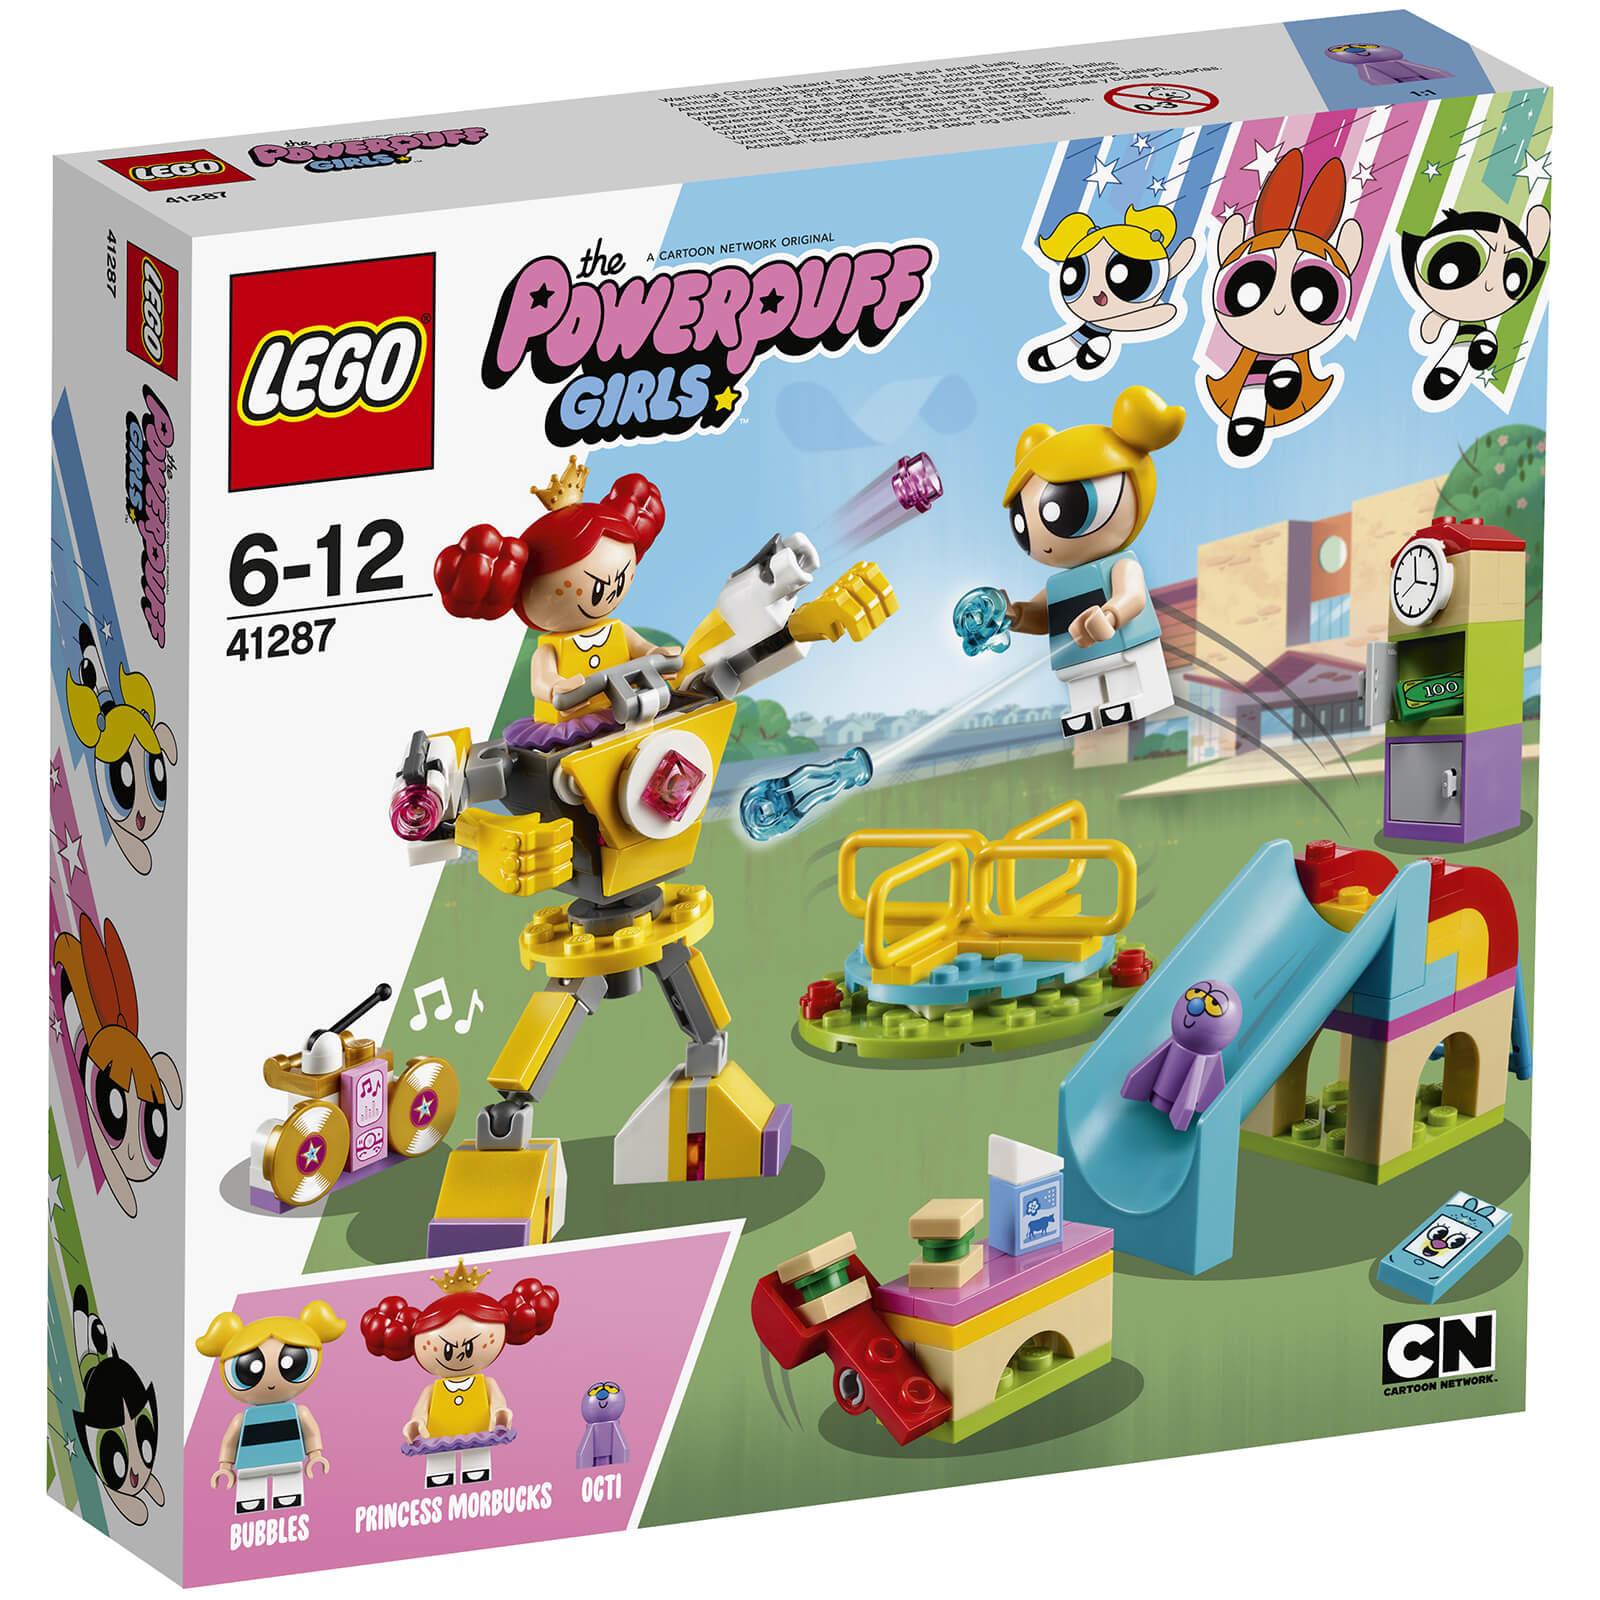 Lego Powerpuff Girls: Bubbles' Playground Showdown (41287)